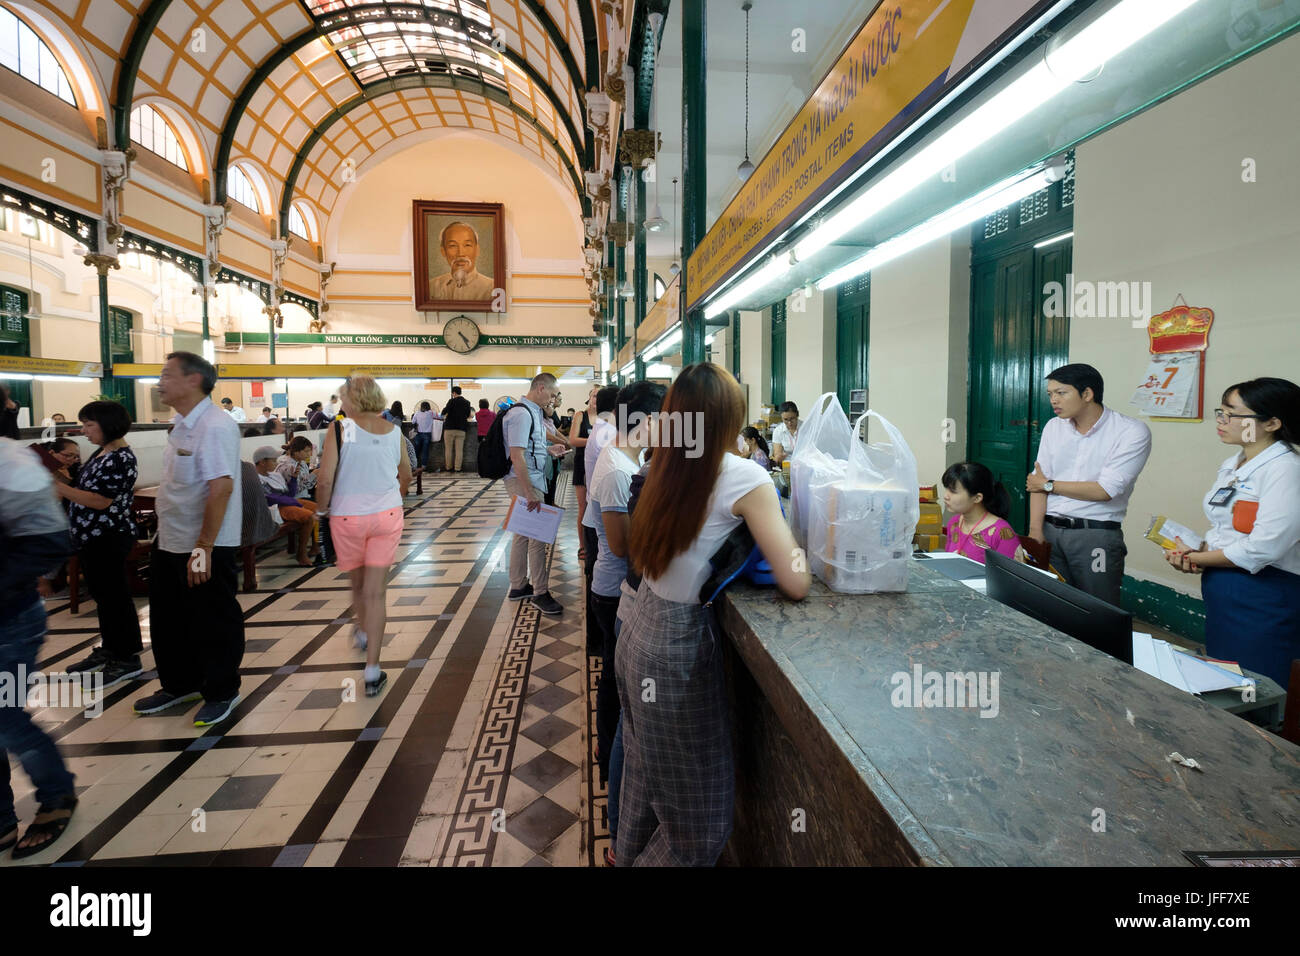 Saigon Central Post Office, Ho Chi Minh City, Vietnam, Asia - Stock Image